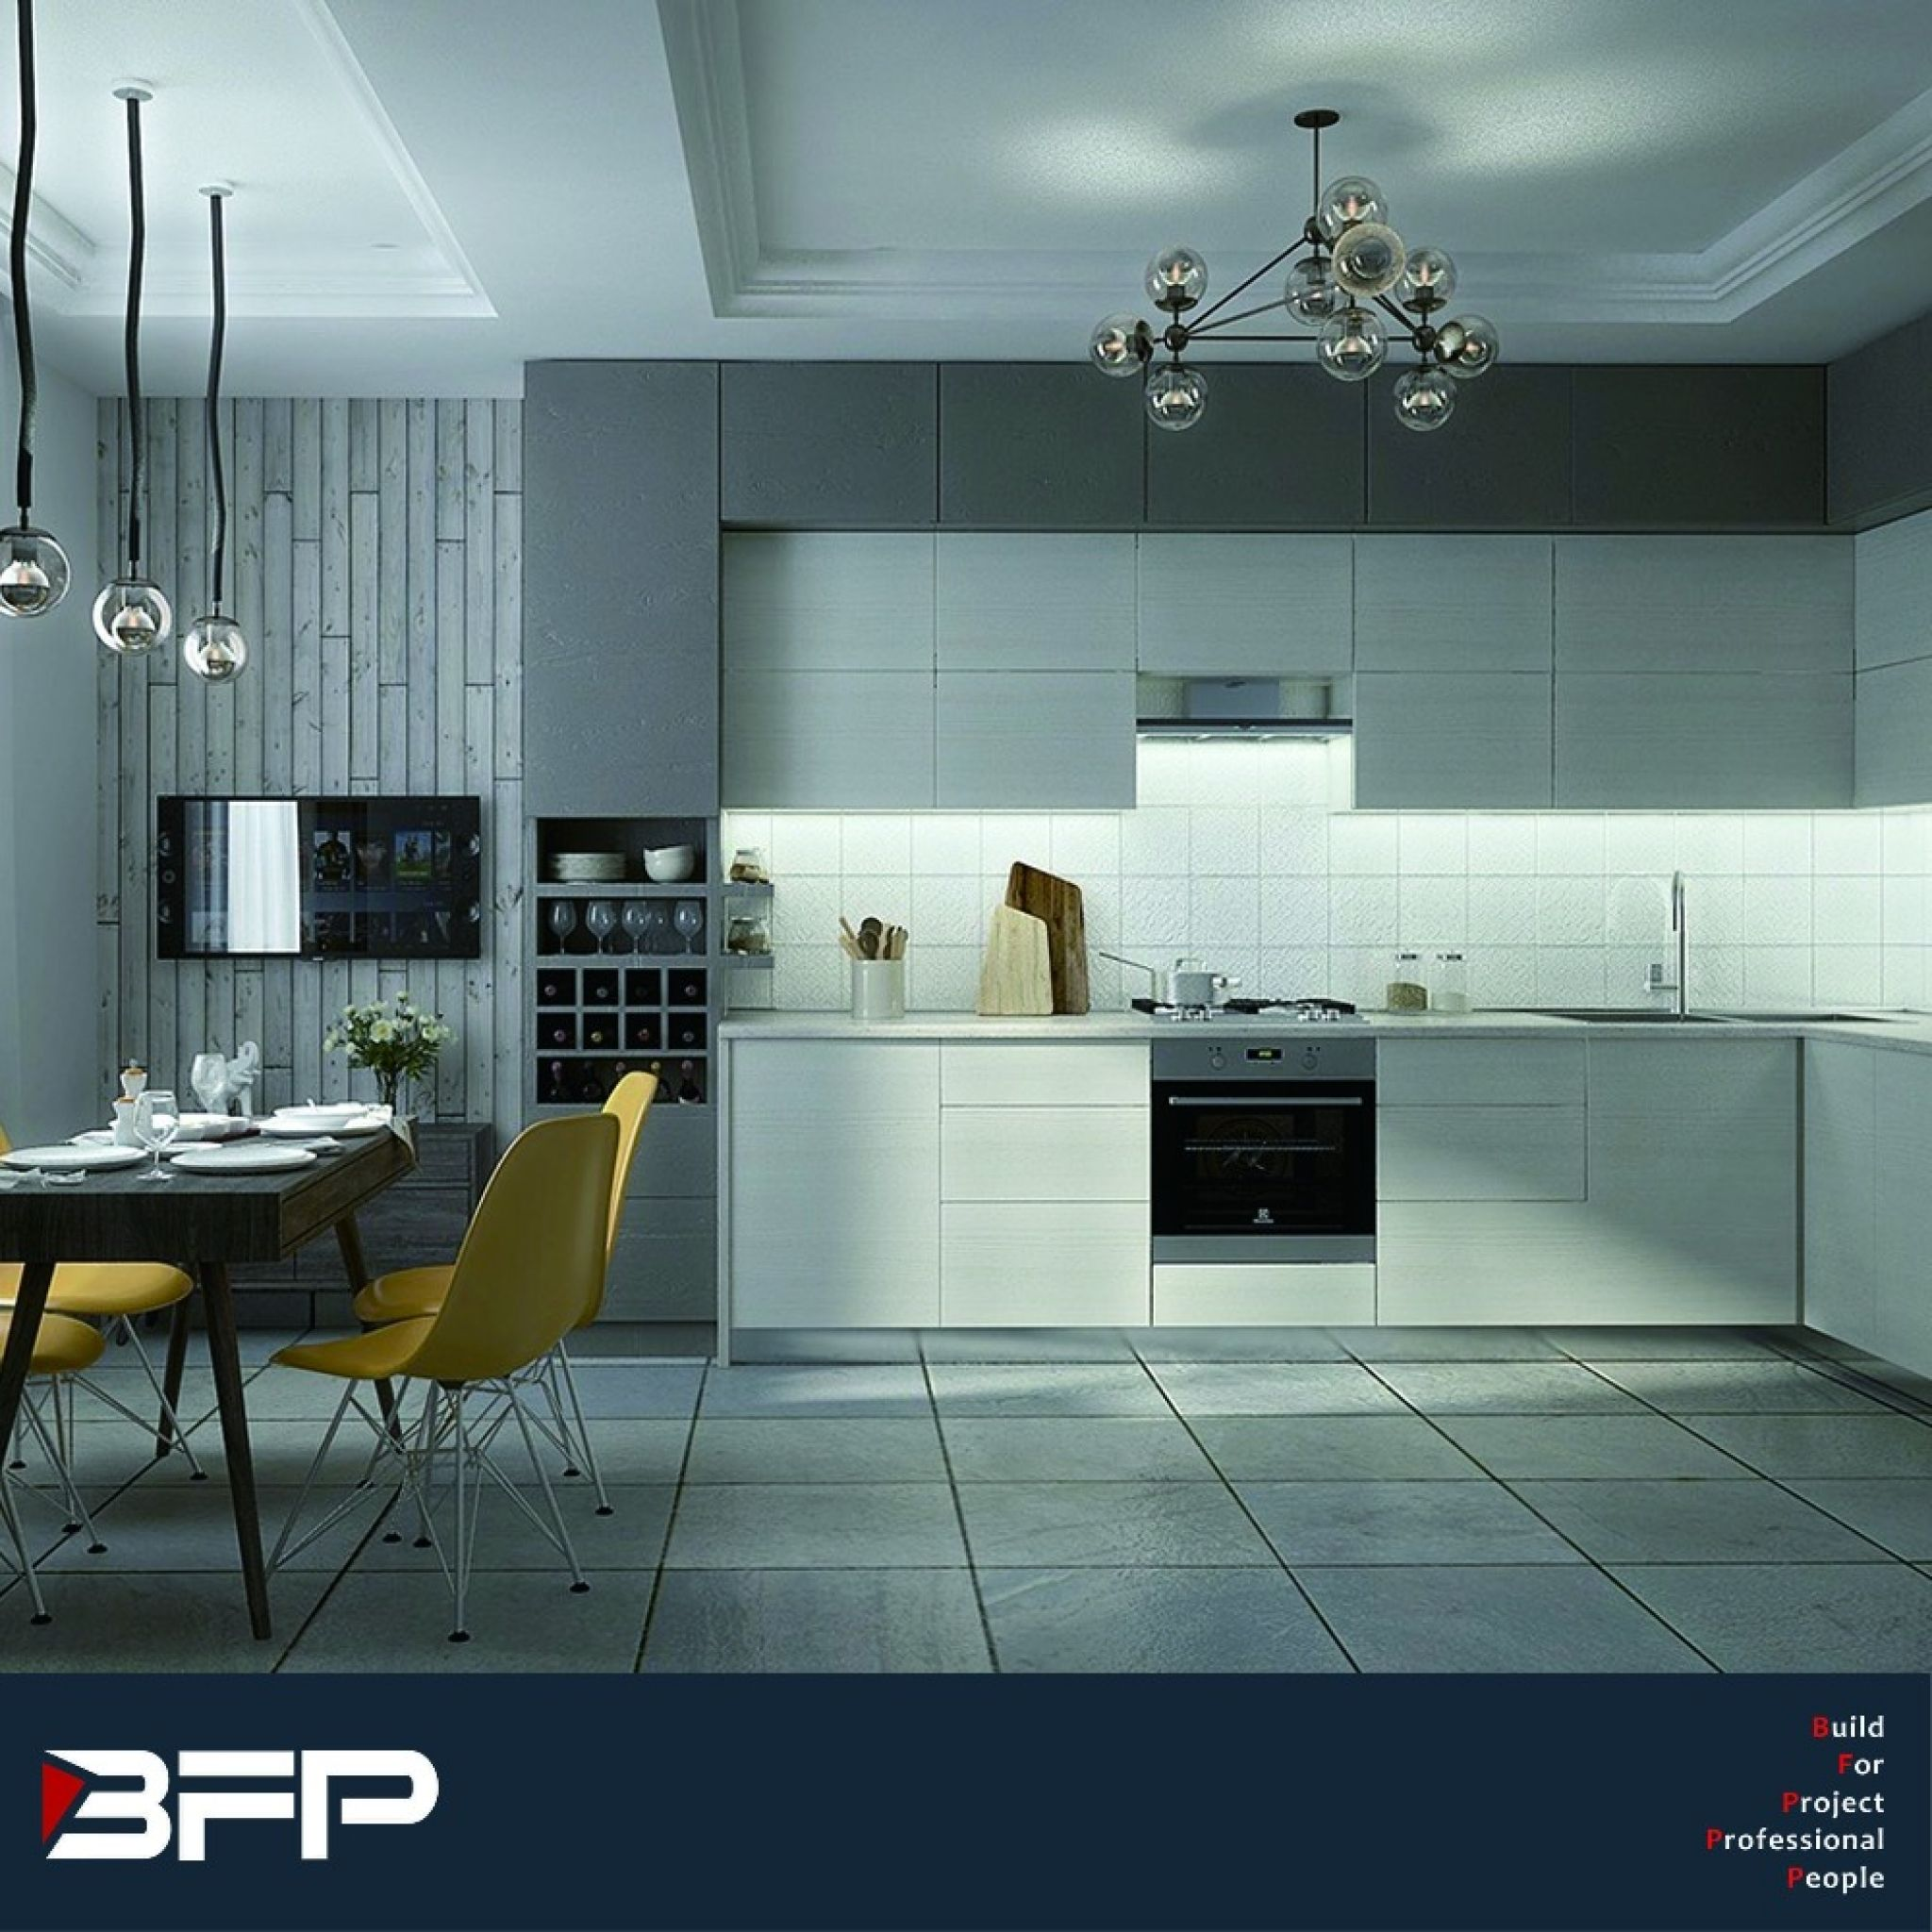 waterproof kitchen cabinets - home renovation ideas kitchen Check ...